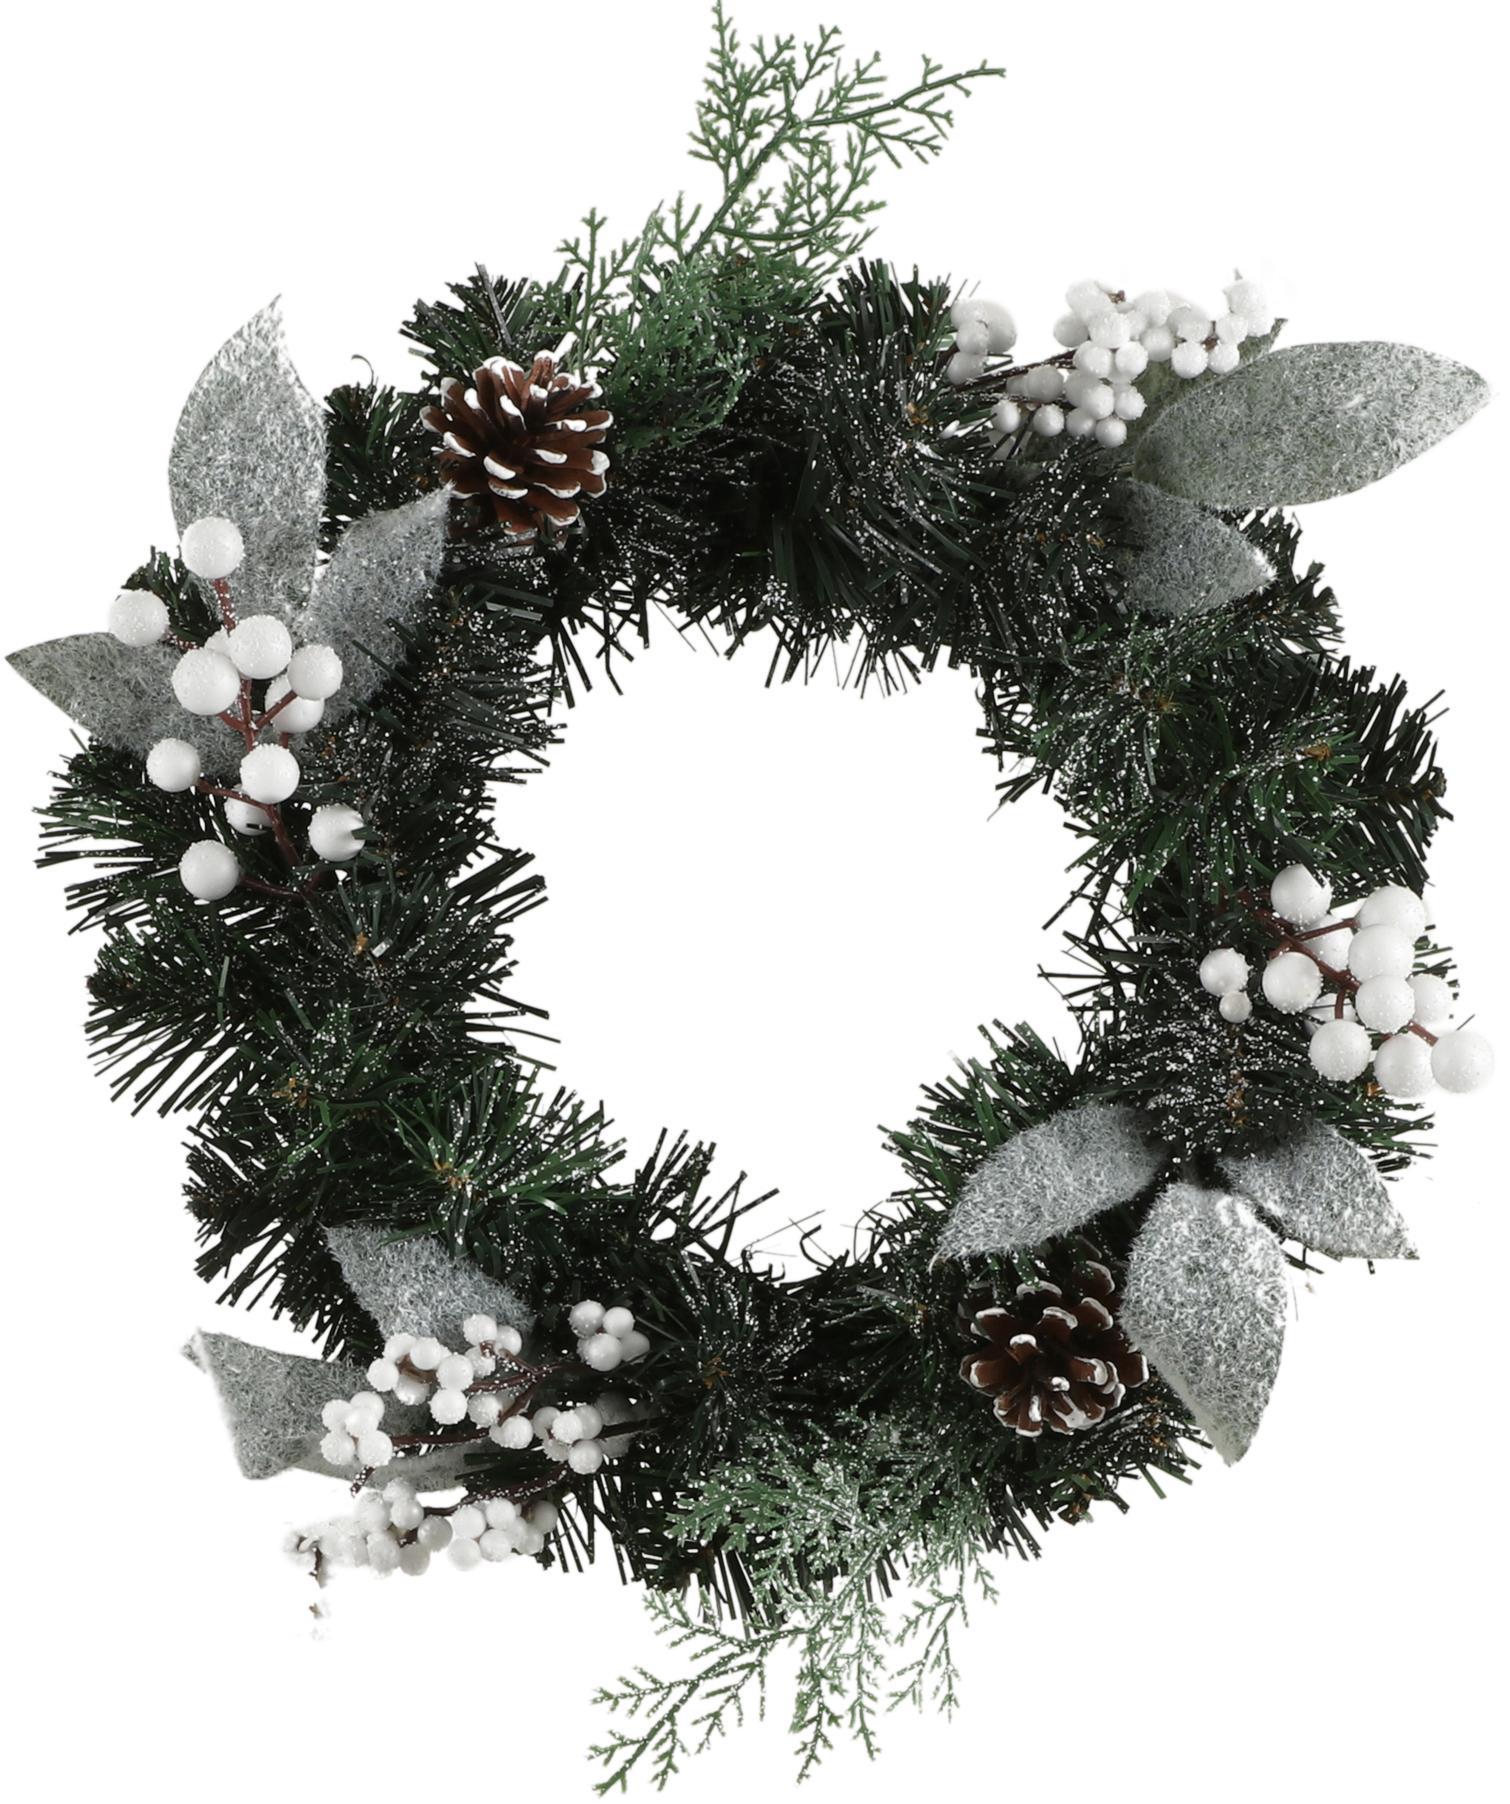 Ghirlanda natalizia artificiale Hailey, Materiale sintetico, Verde, bianco, argento, Ø 30 cm